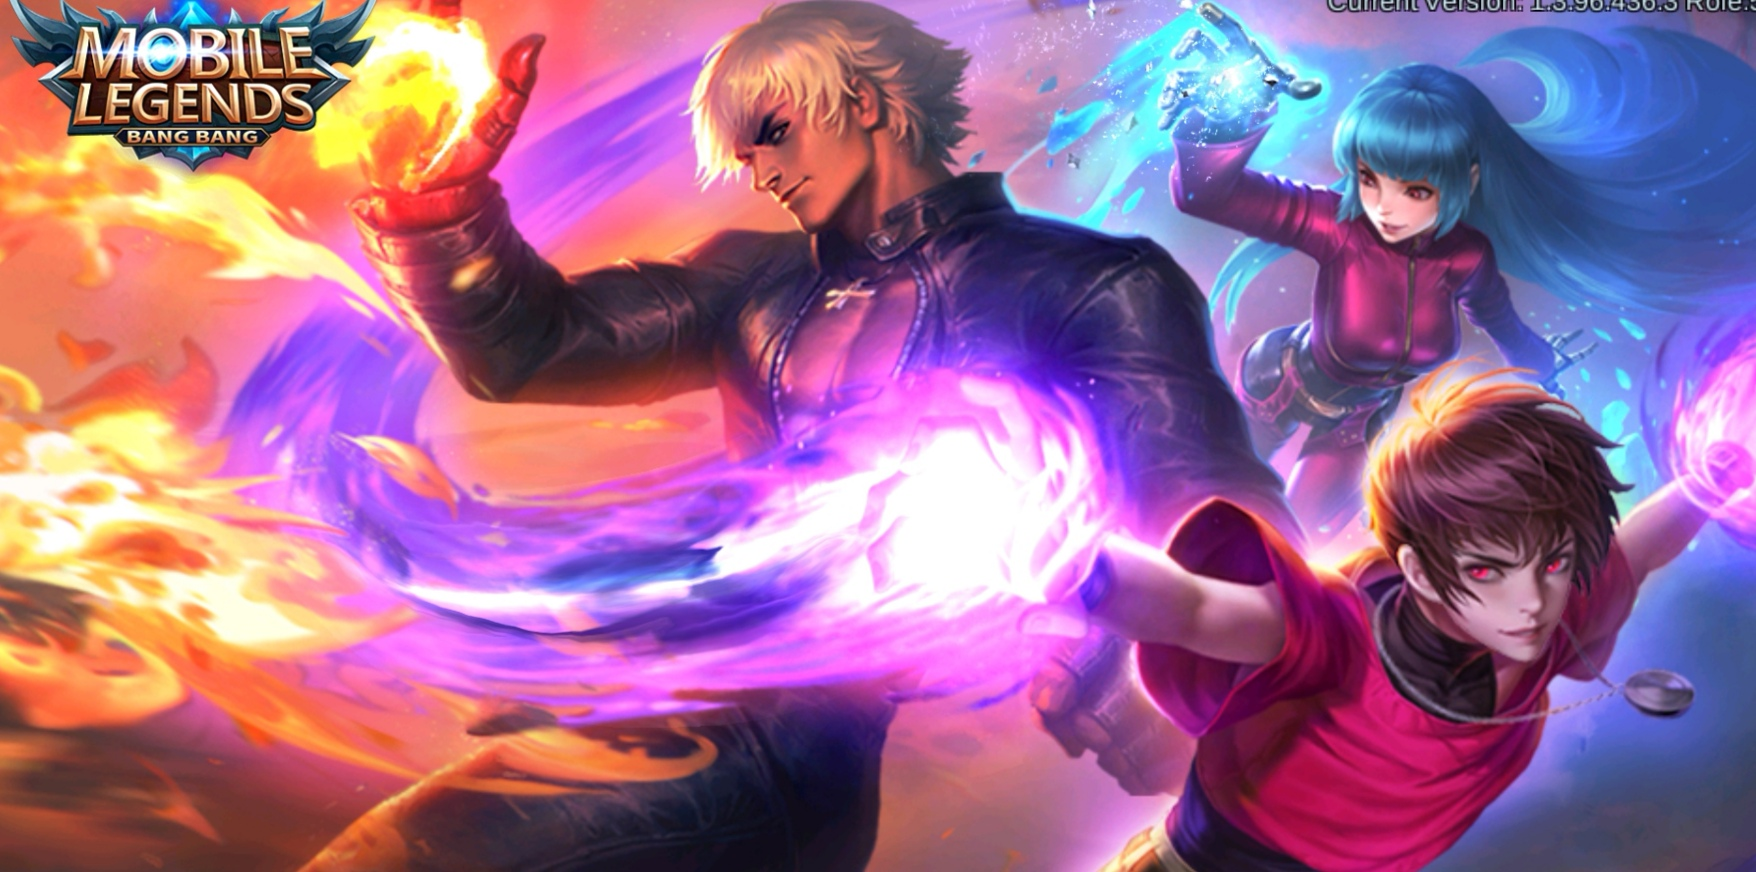 https: img-k.okeinfo.net content 2019 08 25 326 2096367 tips-memilih-hero-mobile-legends-bagi-pemain-pemula-TokDeF9hav.jpg